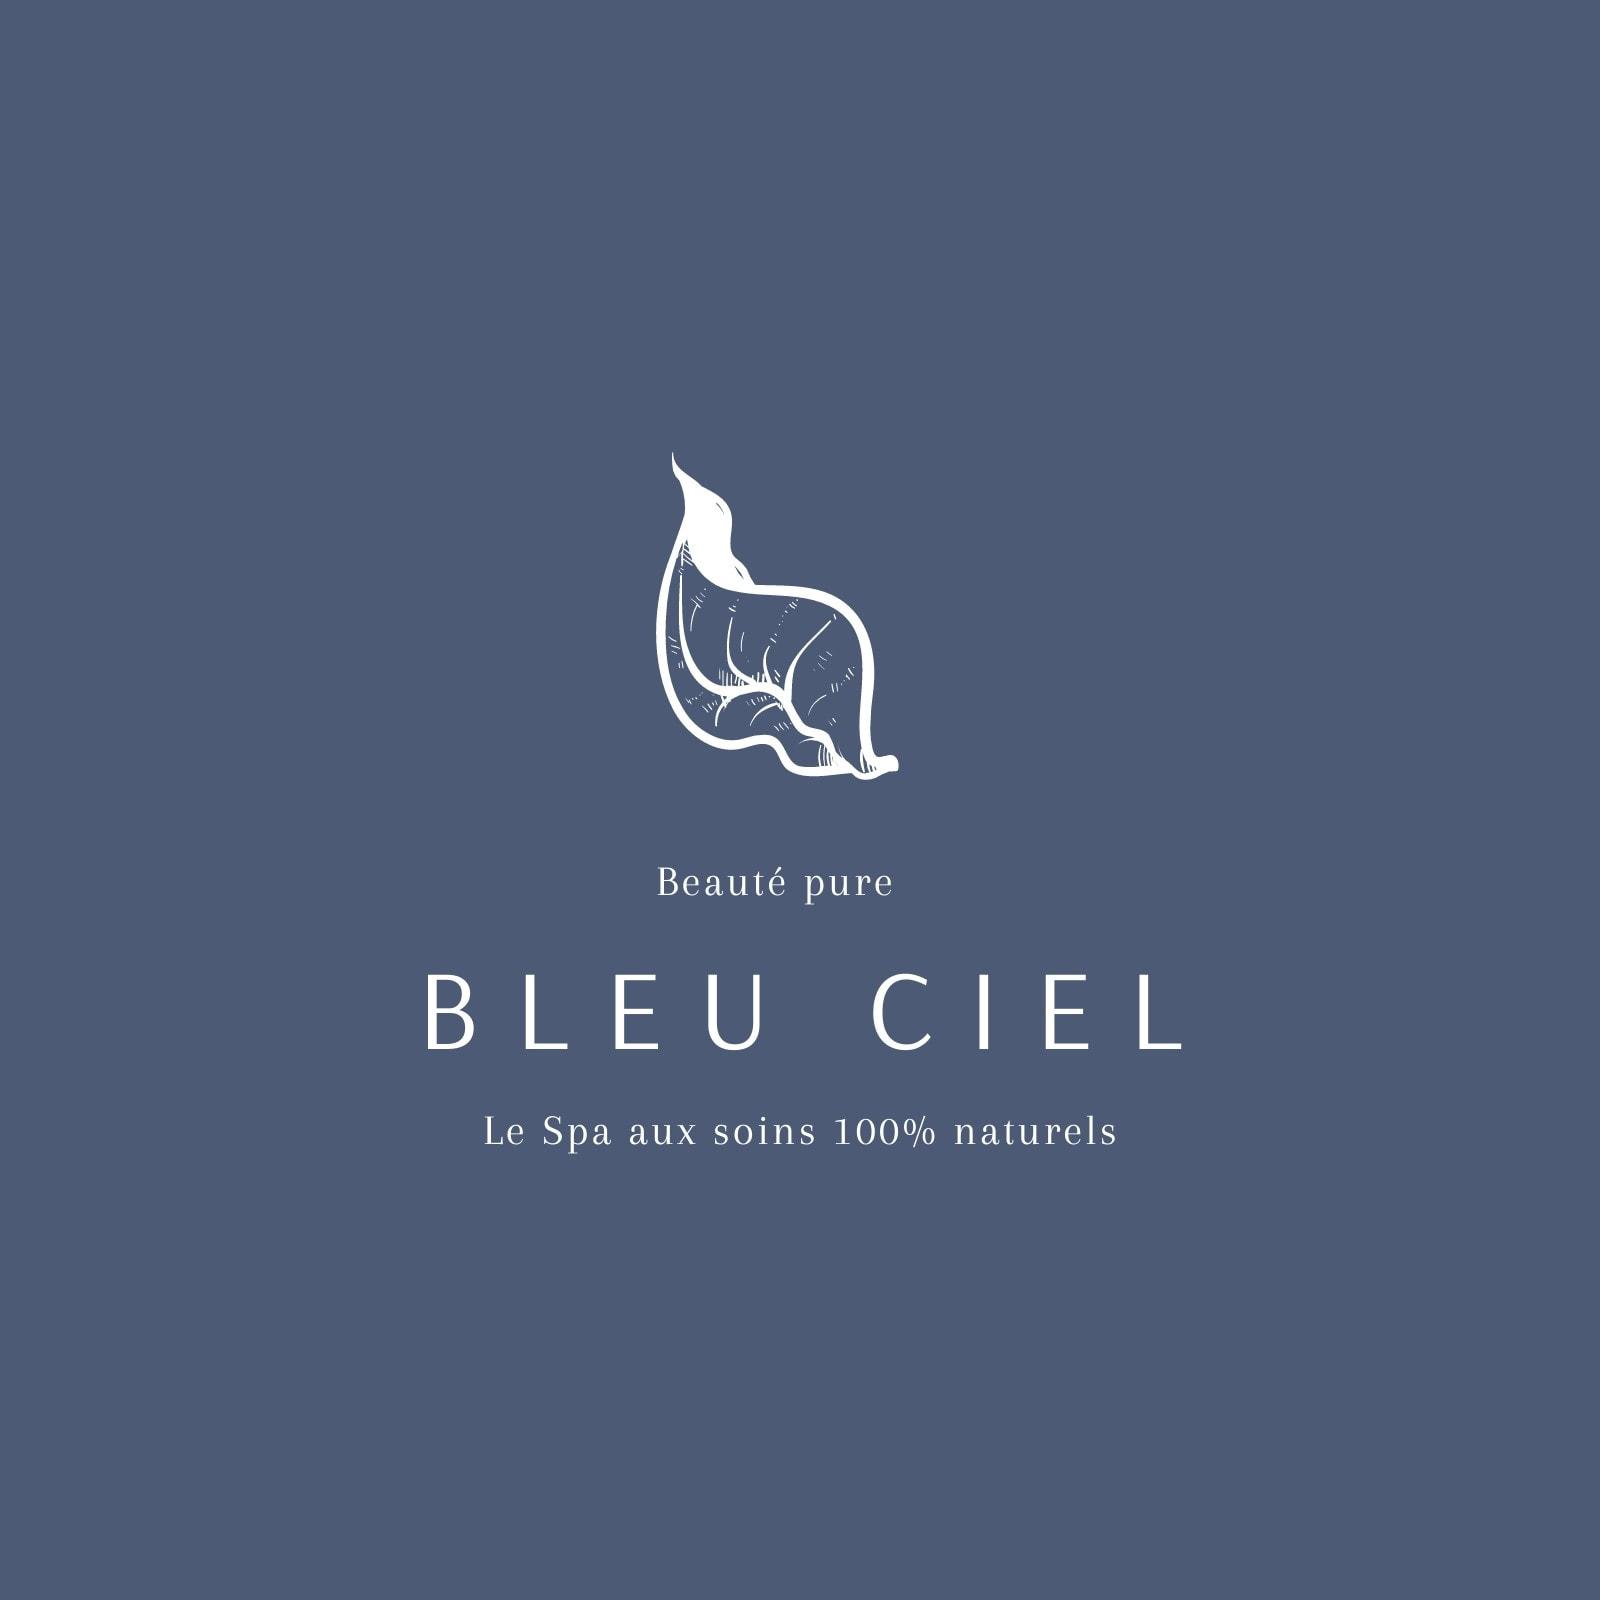 Logo spa fond bleu et typographie blanche